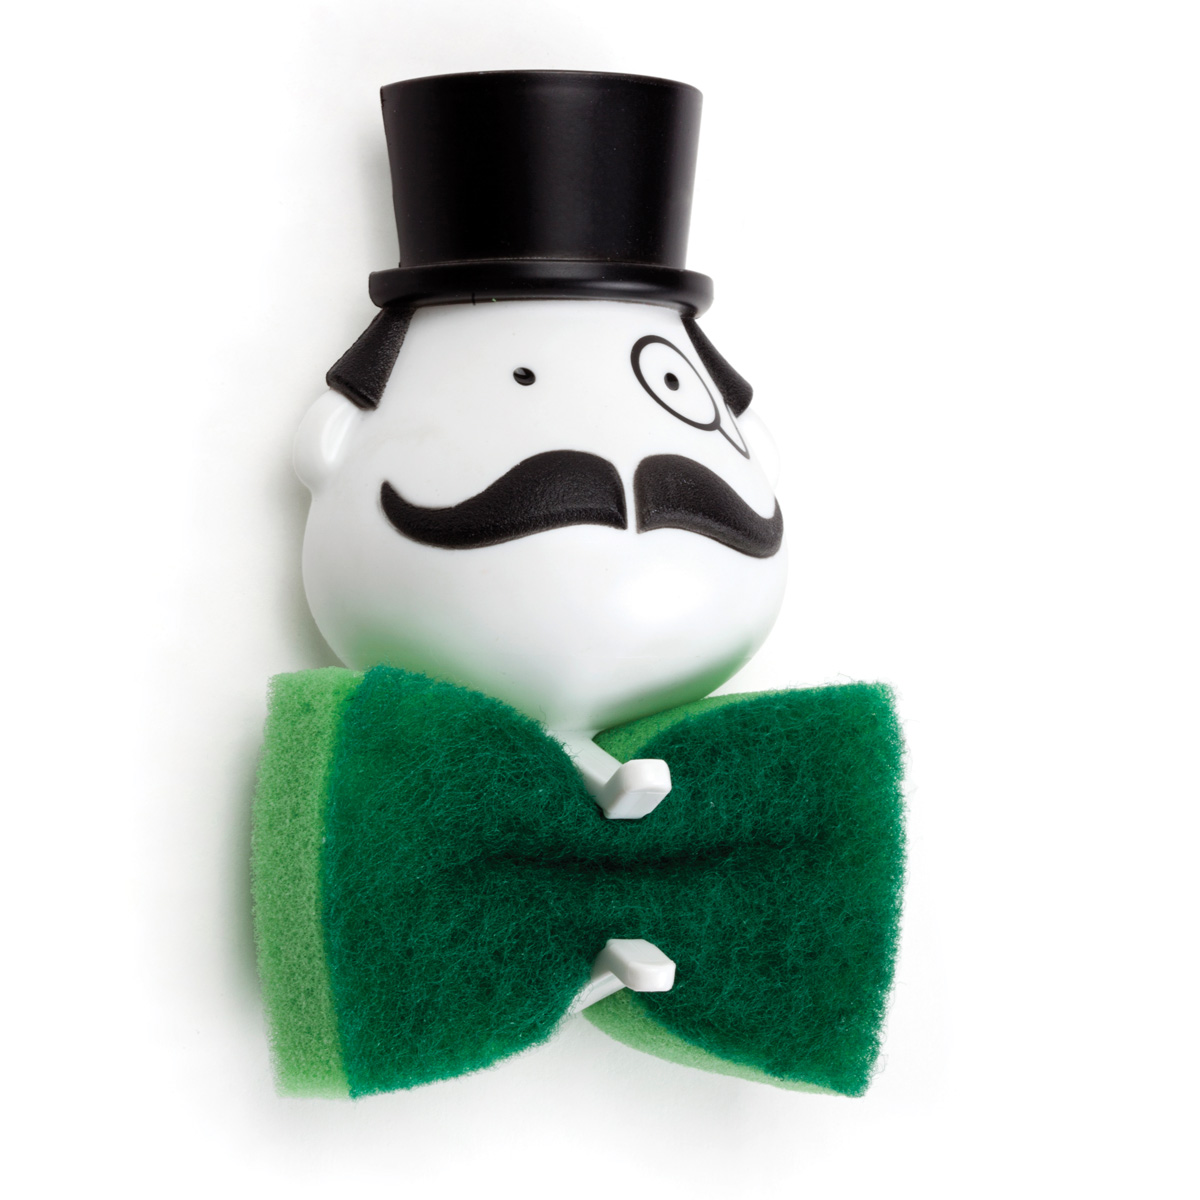 Mr Sponge Bow Tie Scrub Holder The Green Head